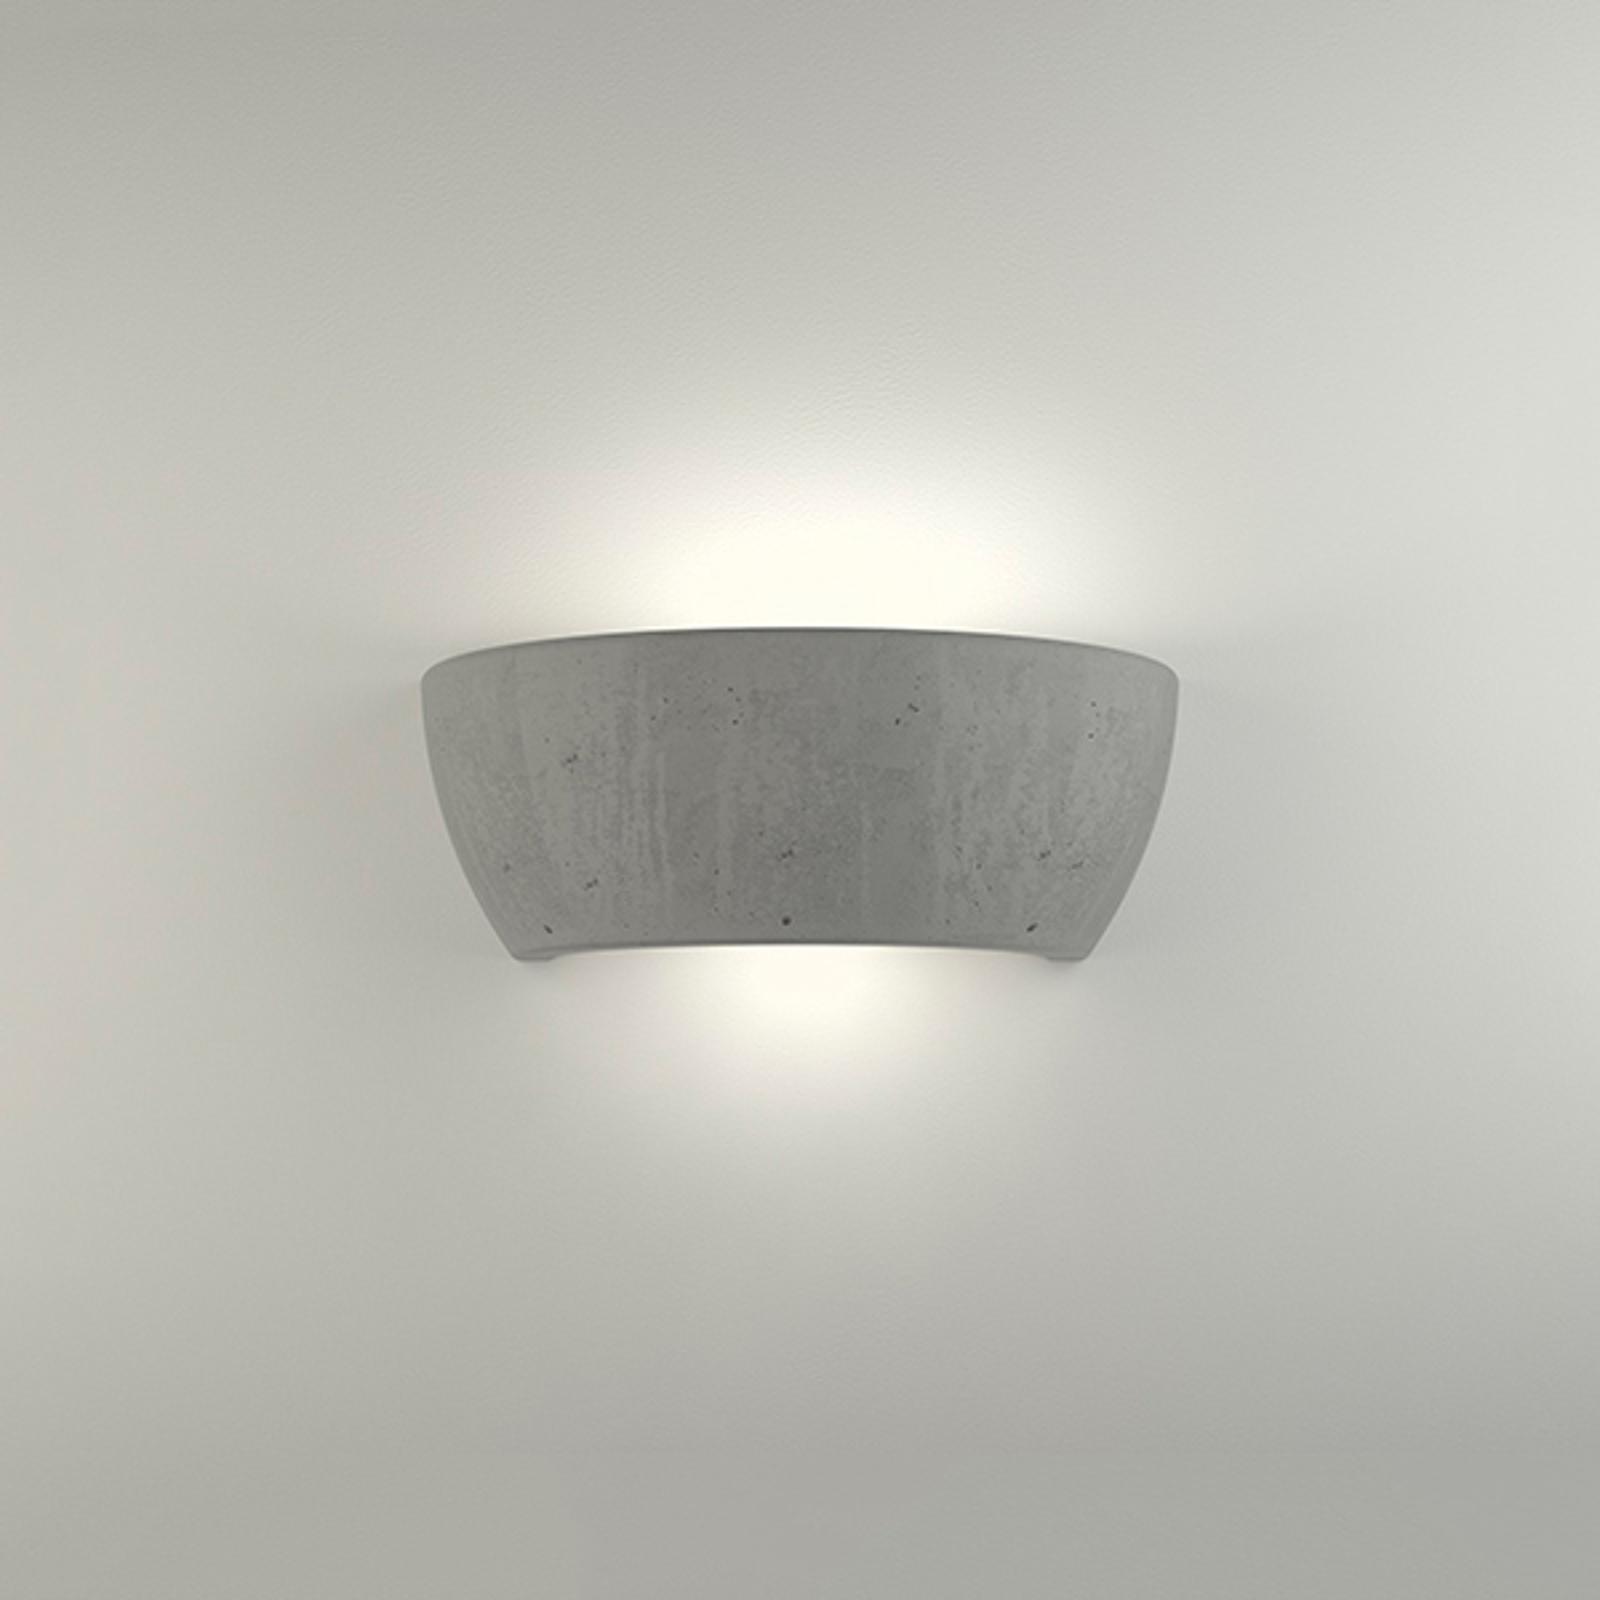 LED wandlamp 2457 beton 3.000 K niet dimbaar